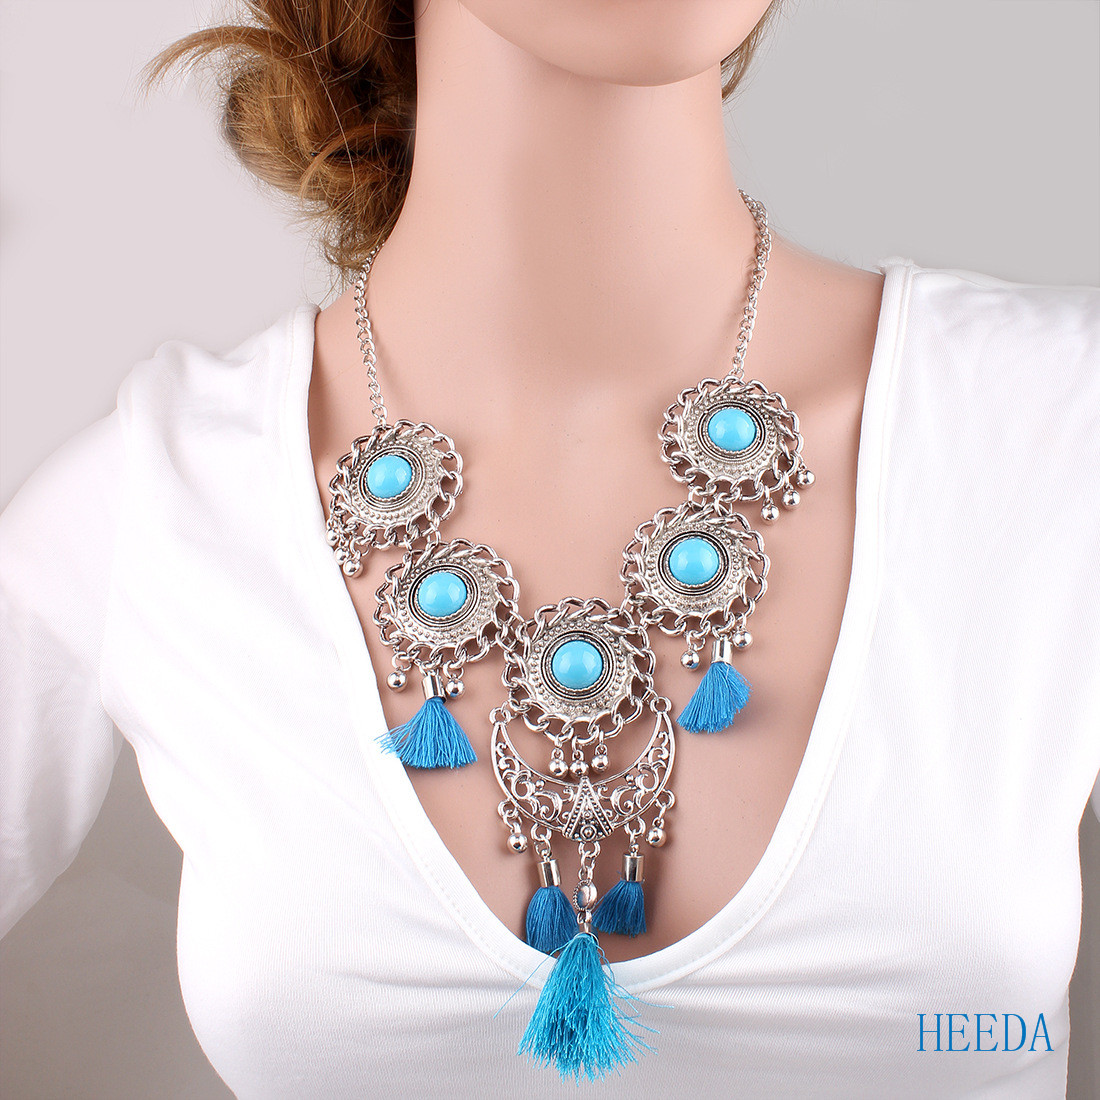 2018 New Retro Style Necklace Earring Set Boho Resin Fashion Tassel Jewelry Set Black,Bl ...